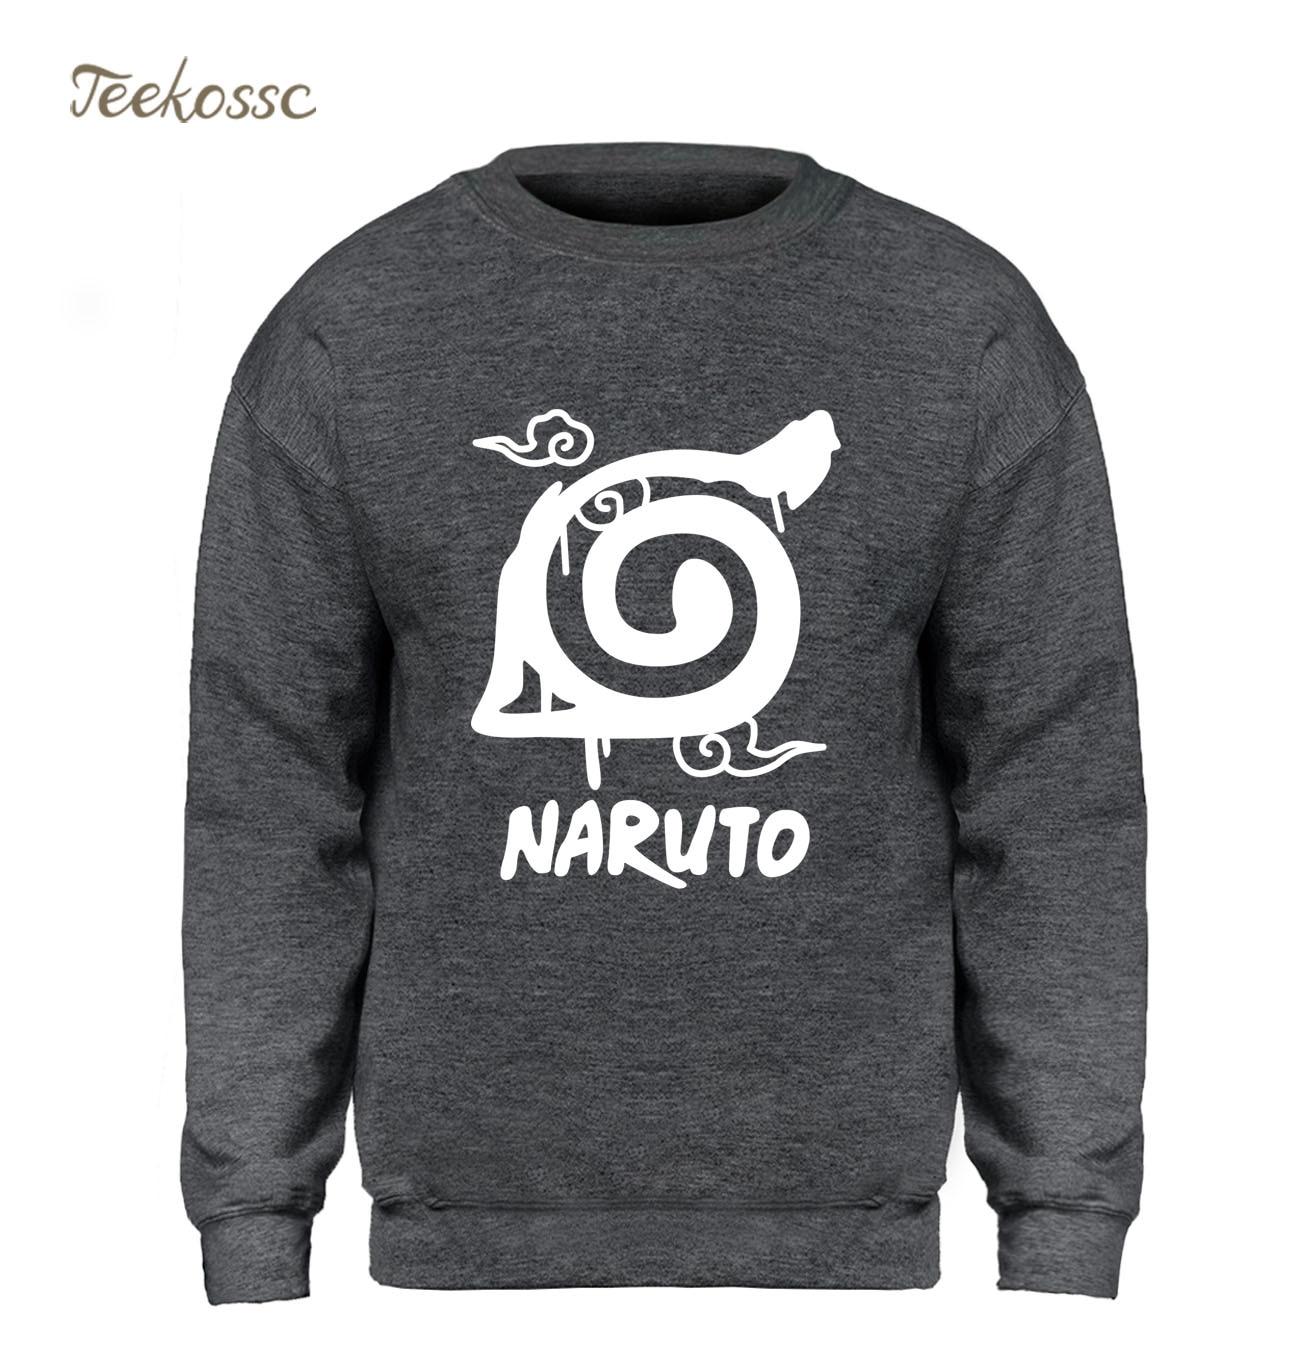 Japan Anime Sweatshirt Men Naruto Uzumaki Hoodie Harajuku Sweatshirts 2018 Winter Autumn Fleece Warm Gray Slim Fit Hoodies Mens